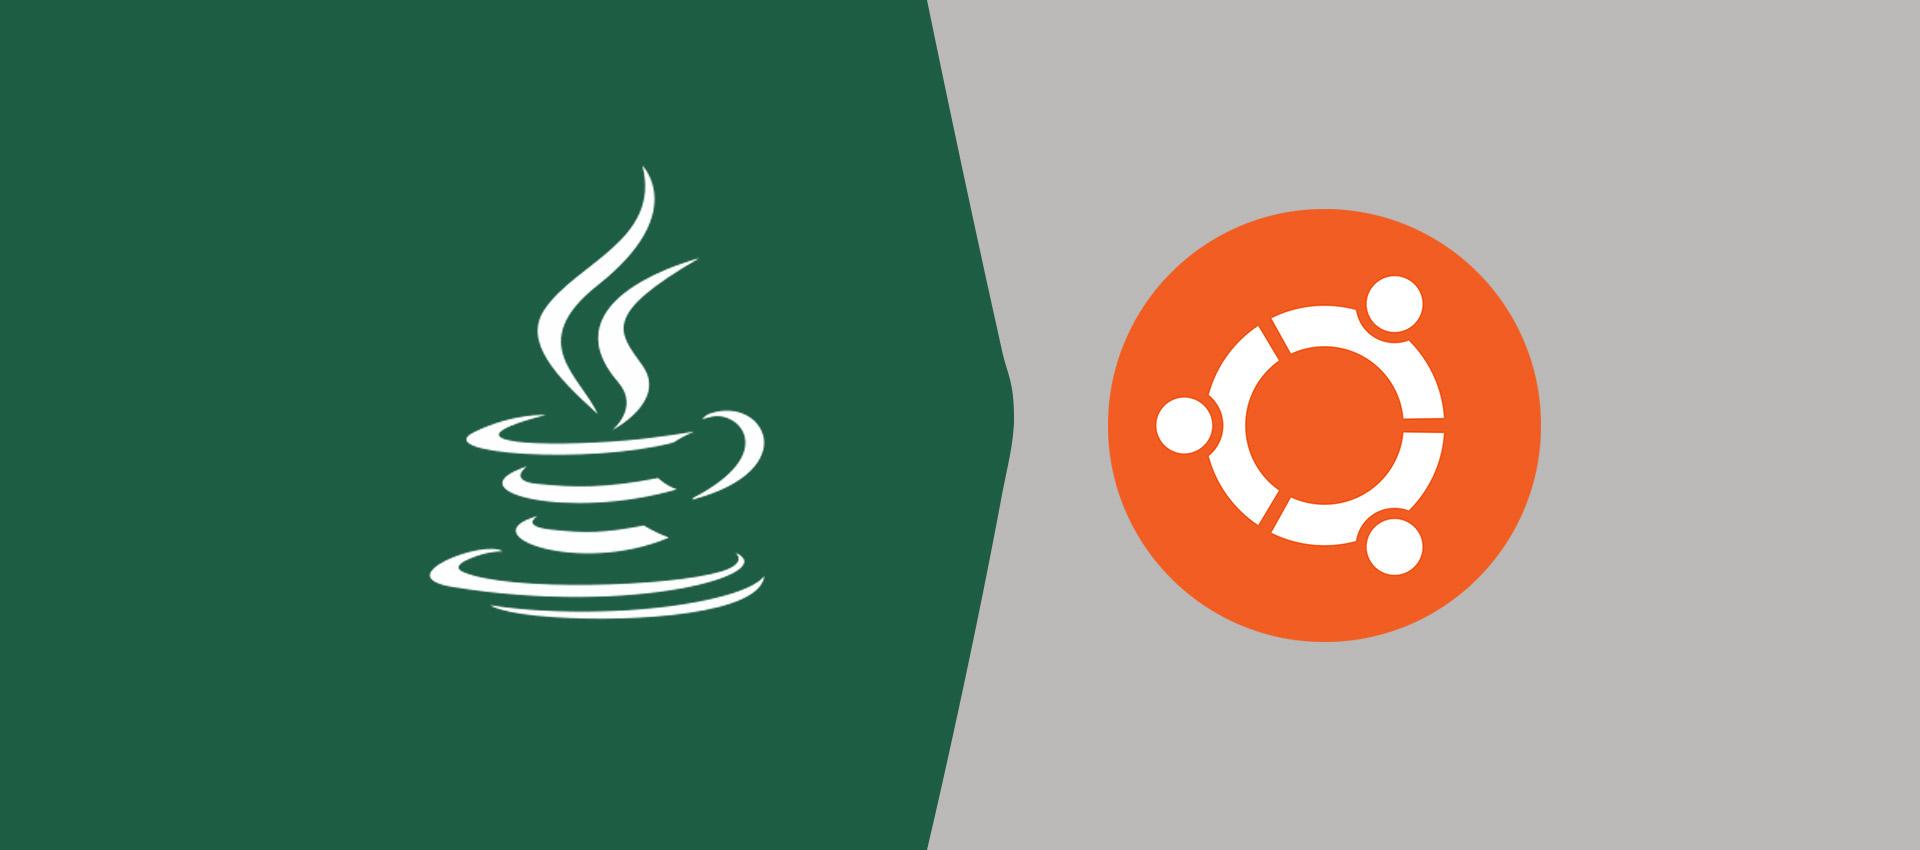 How To Install Java 15 On Ubuntu 20.04 LTS